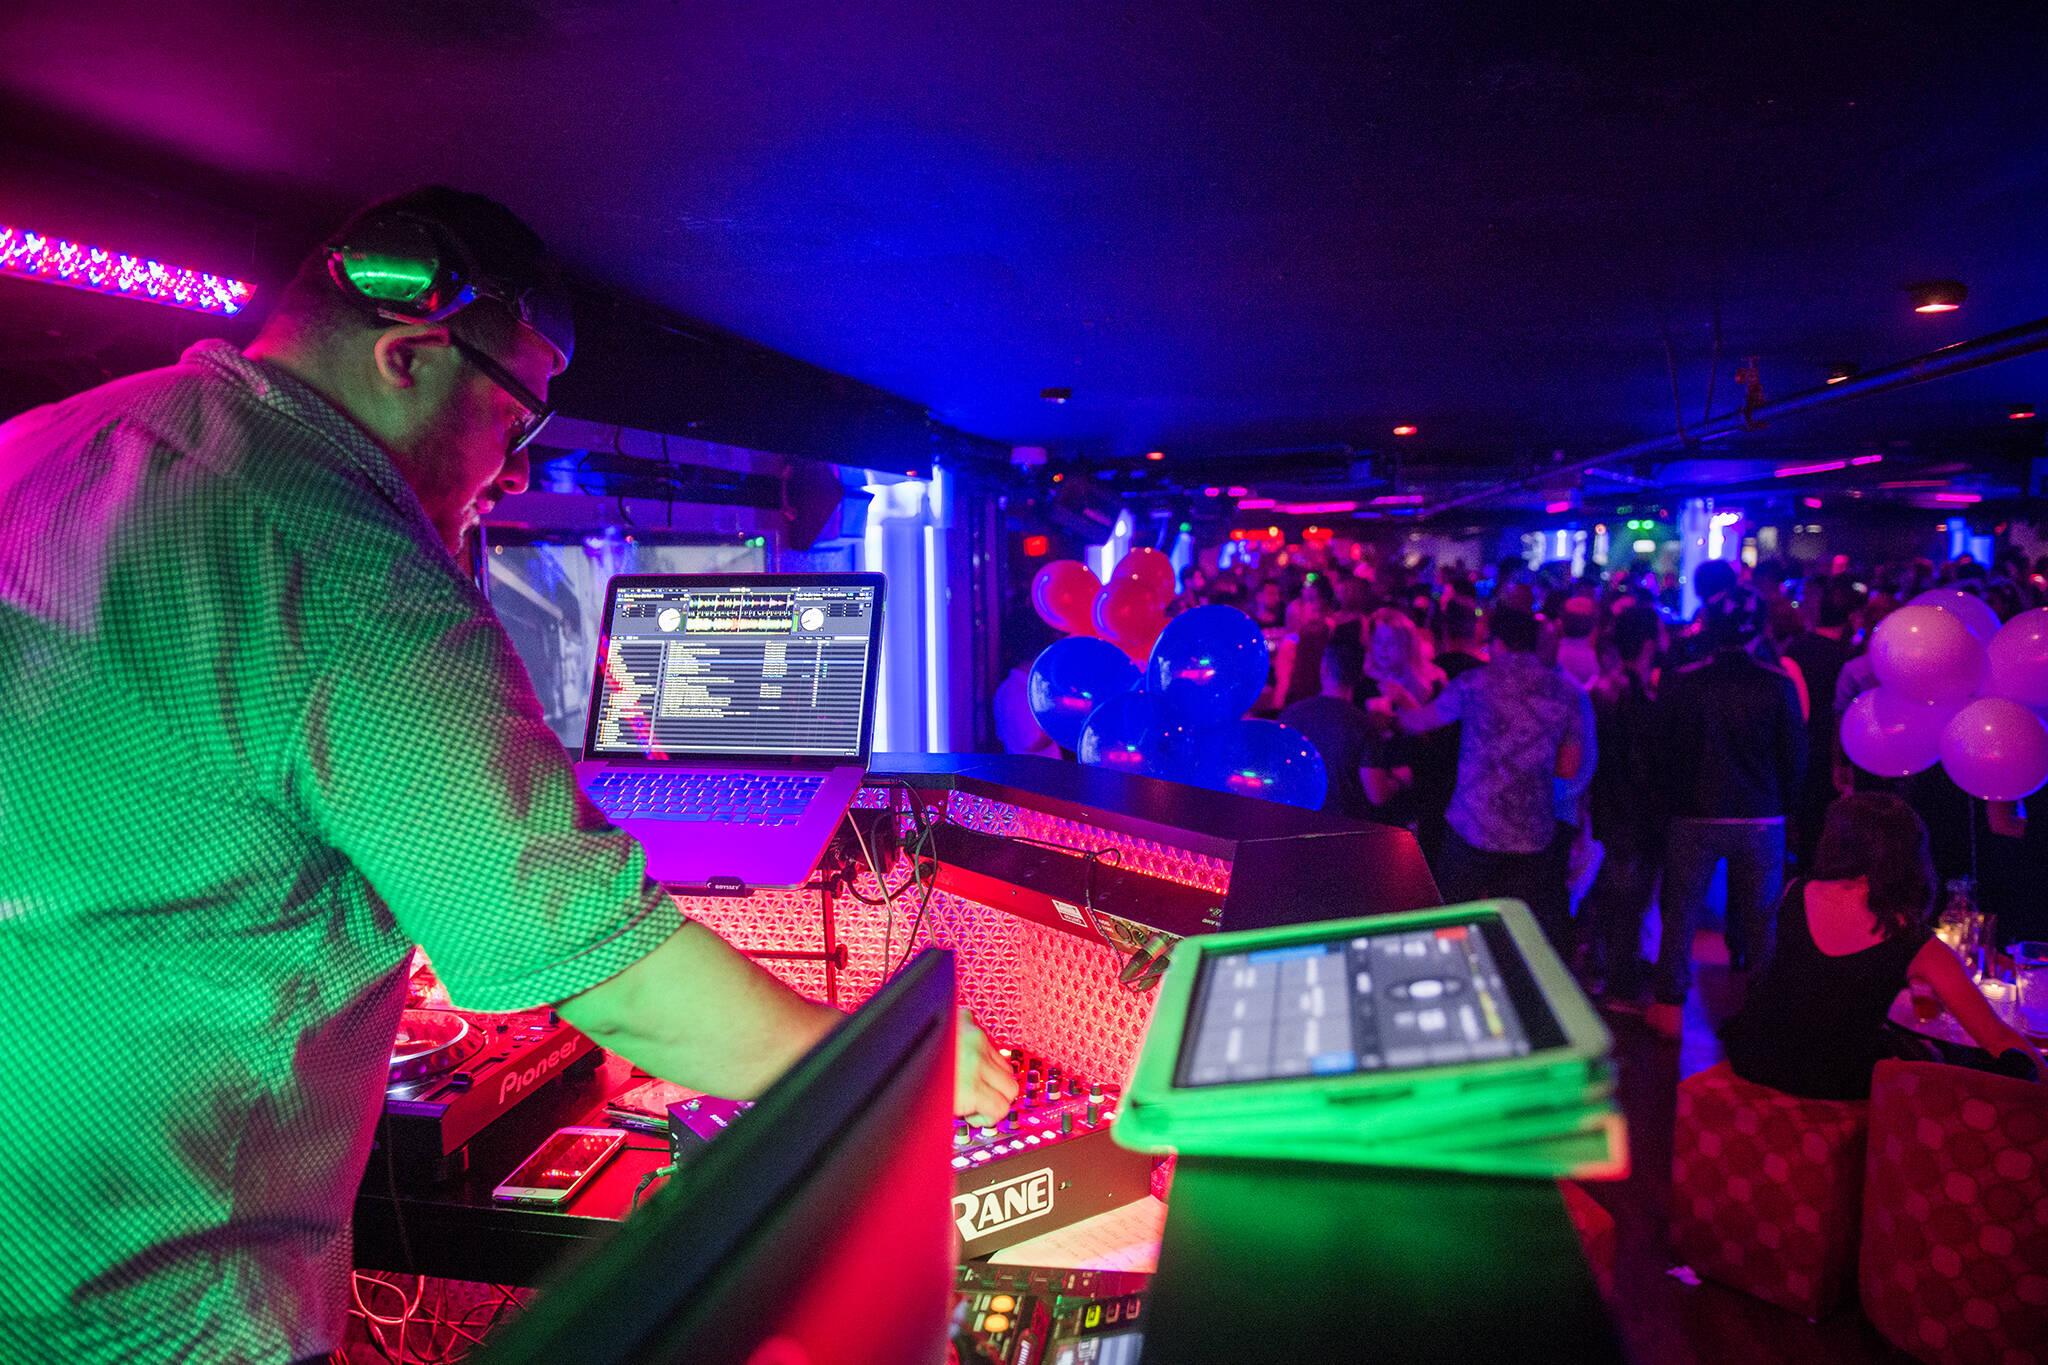 toronto nightclubs